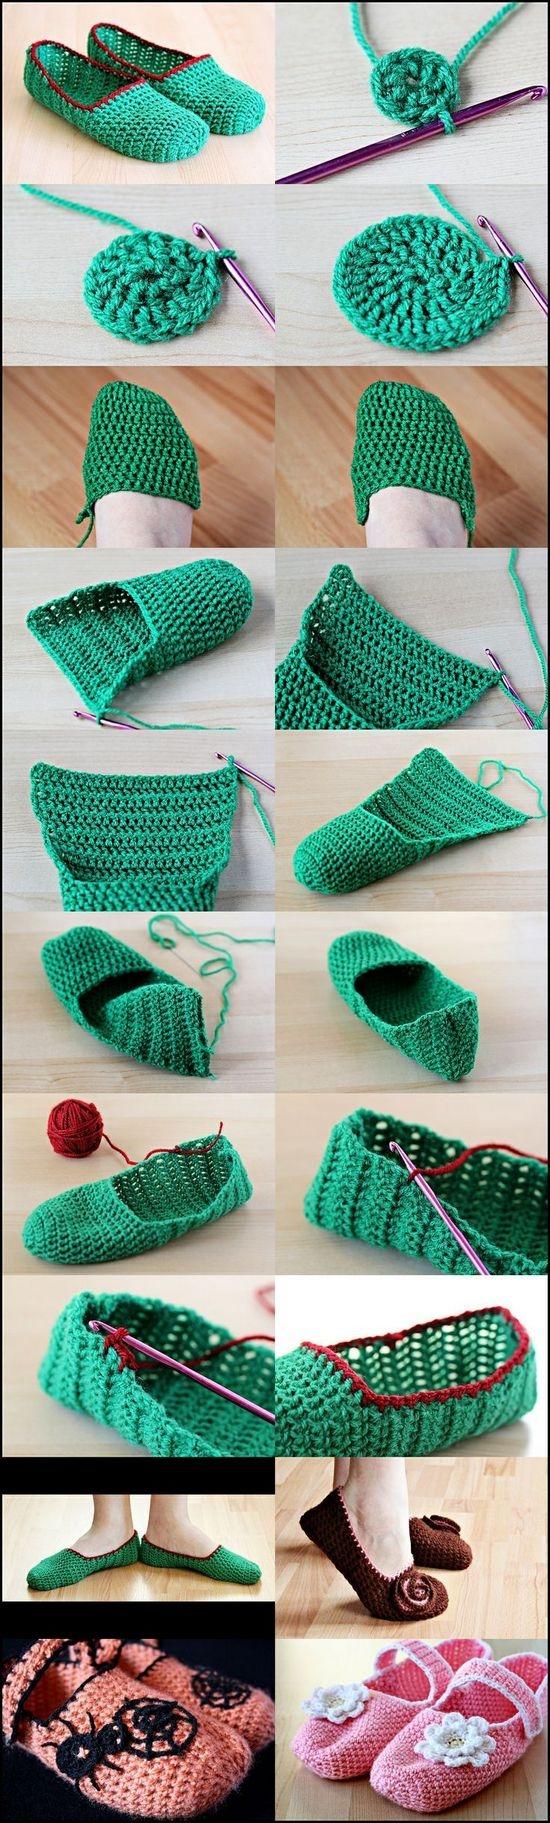 Вязание тапочек крючком: мастер-классы